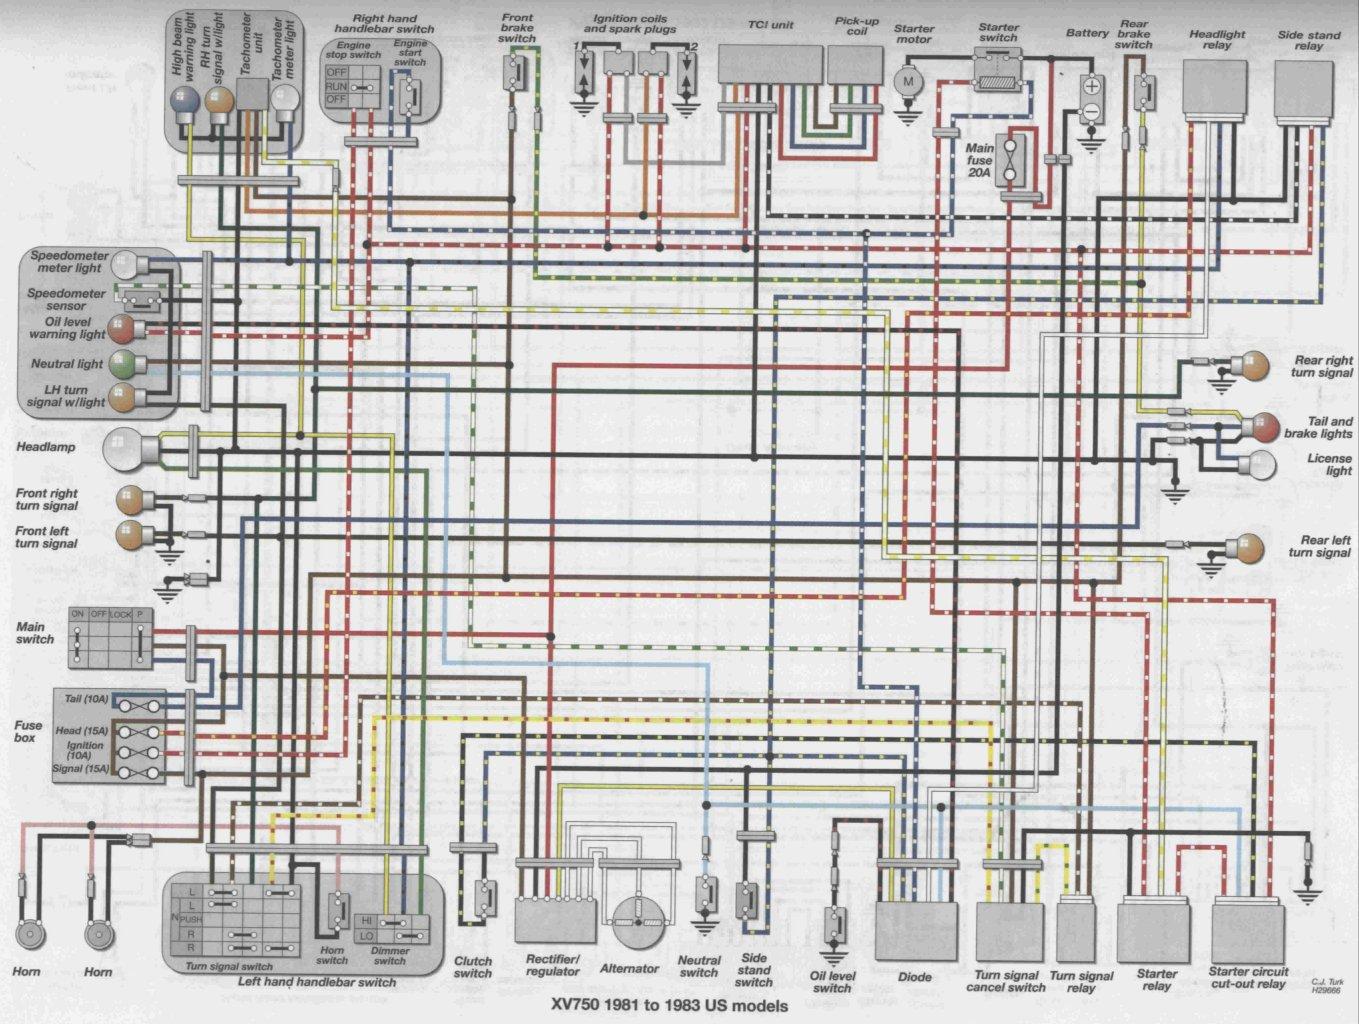 81_83_us_XV750?resize=665%2C501 1986 yamaha virago 1100 wiring diagram 1986 suzuki intruder 1400 1986 yamaha virago 1100 wiring diagram at webbmarketing.co